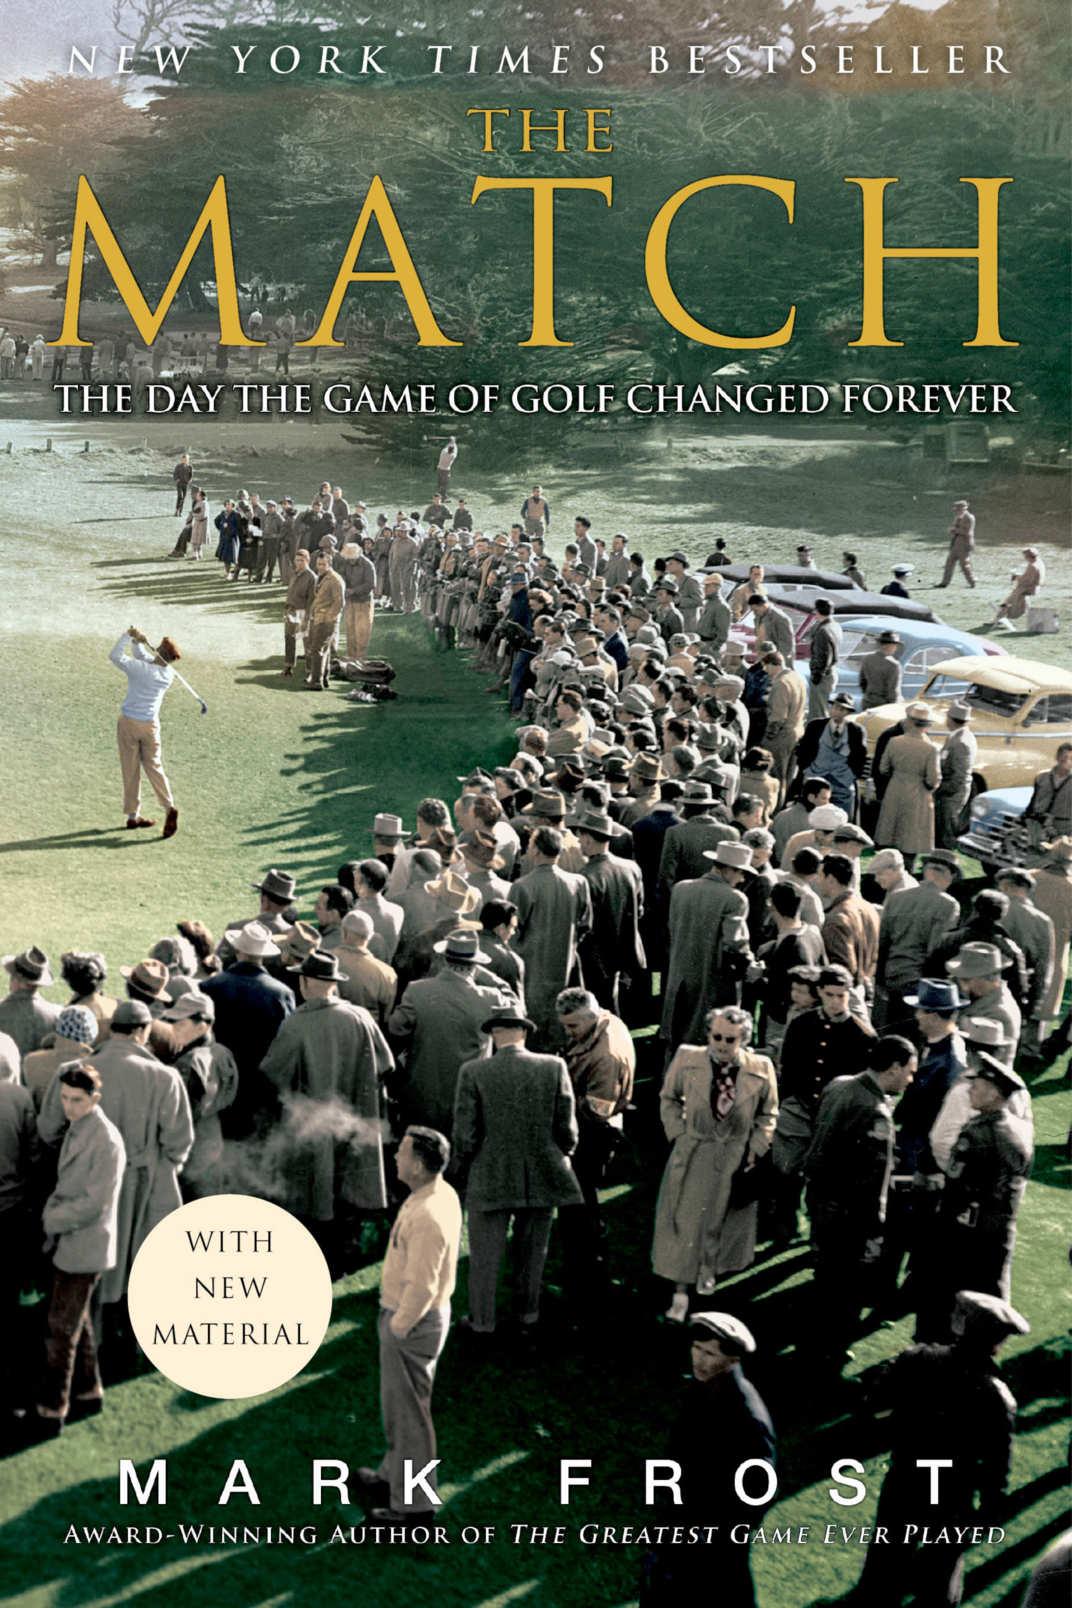 <em>The Match</em> by Mark Frost